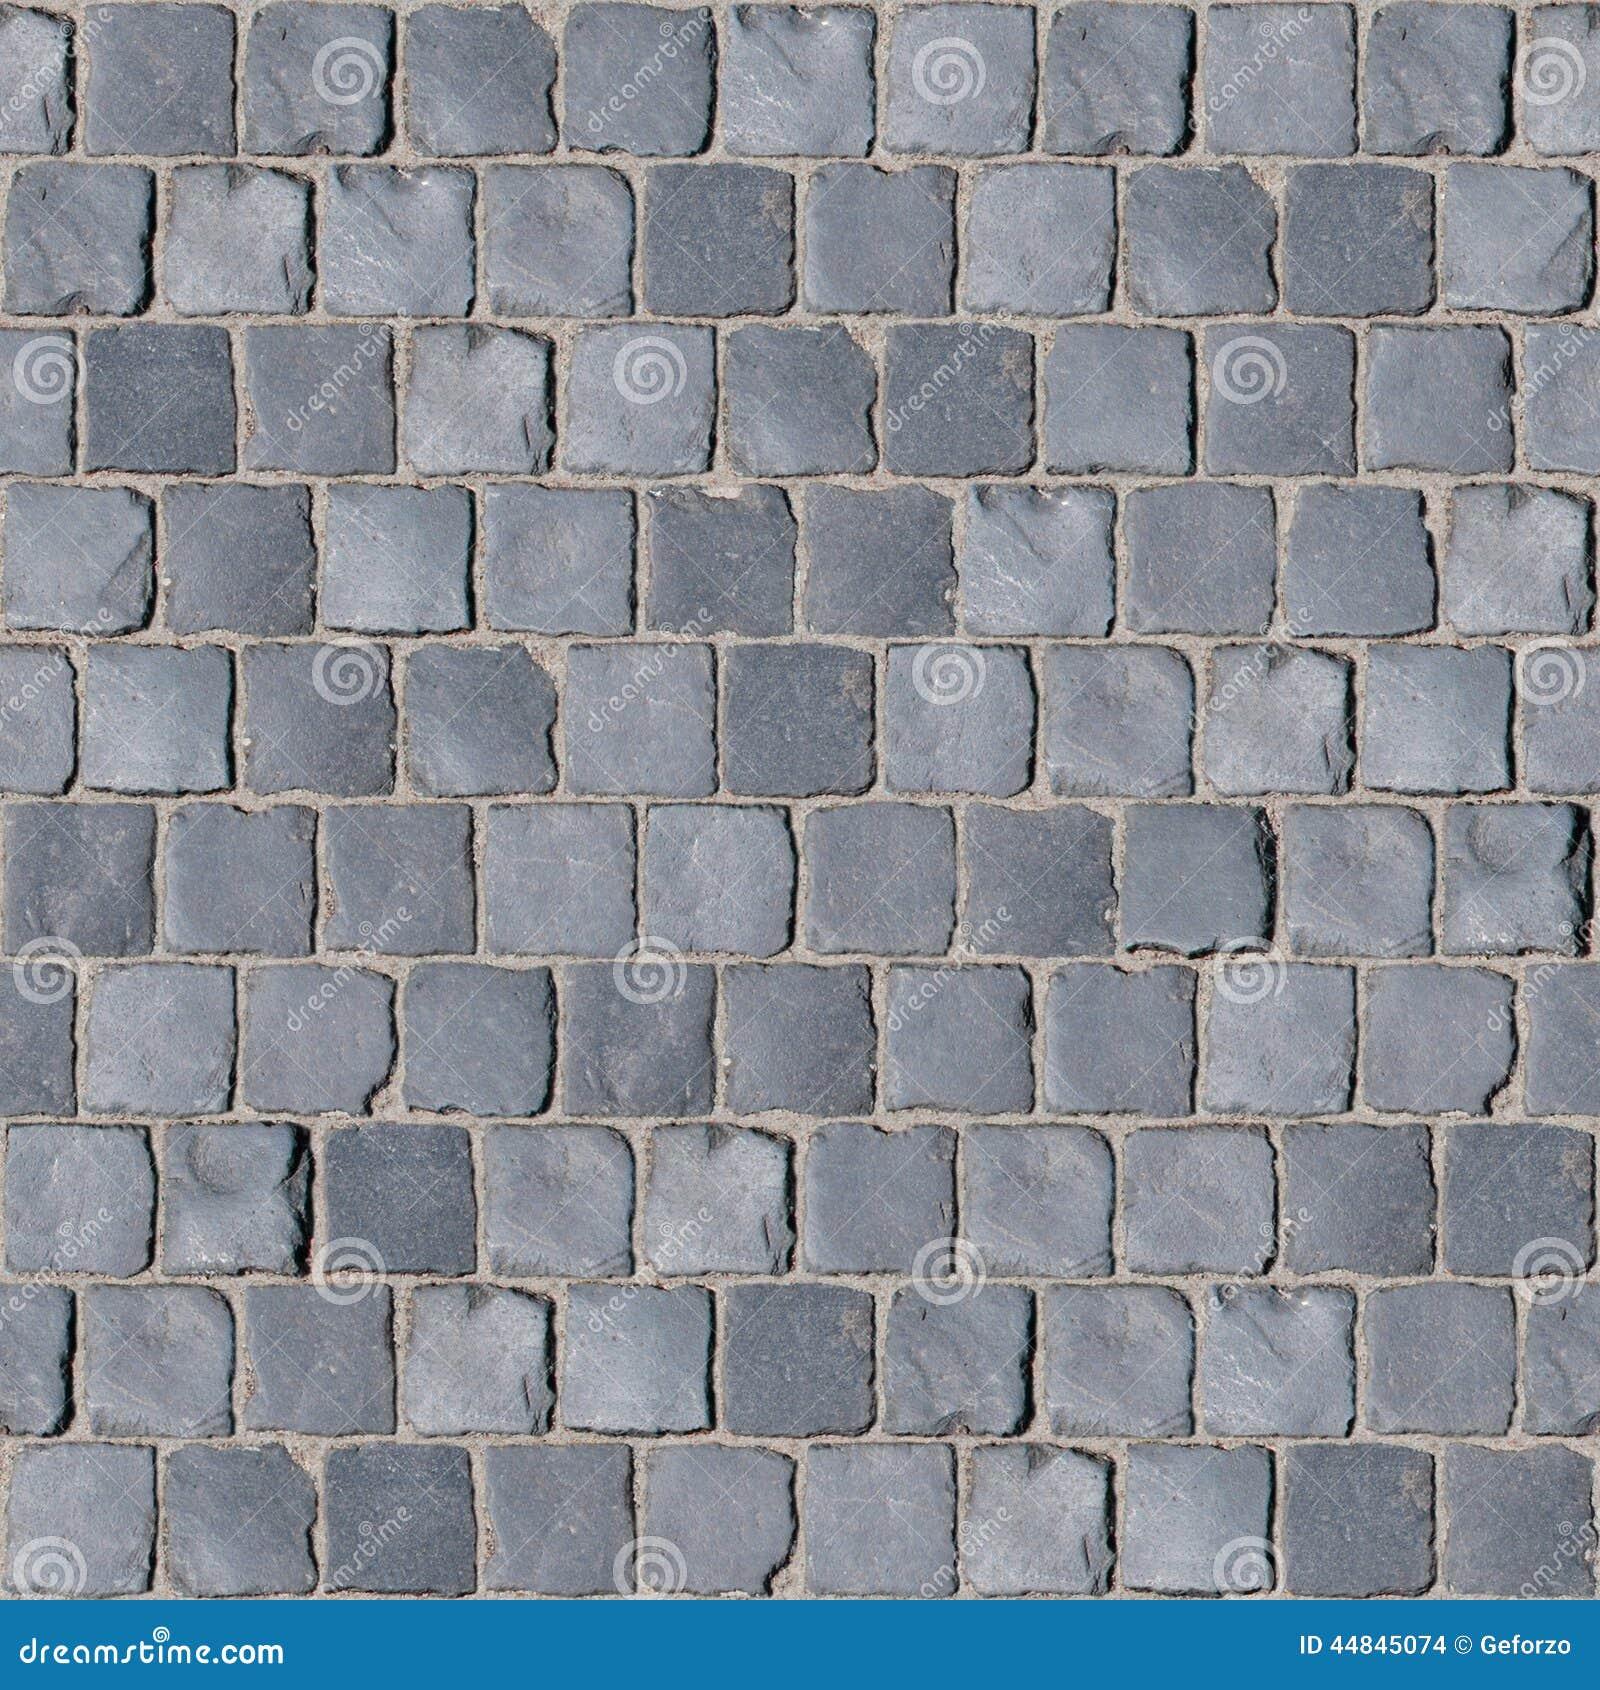 Gray Basalt Cobblestone Texture Stock Photo - Image: 44845074